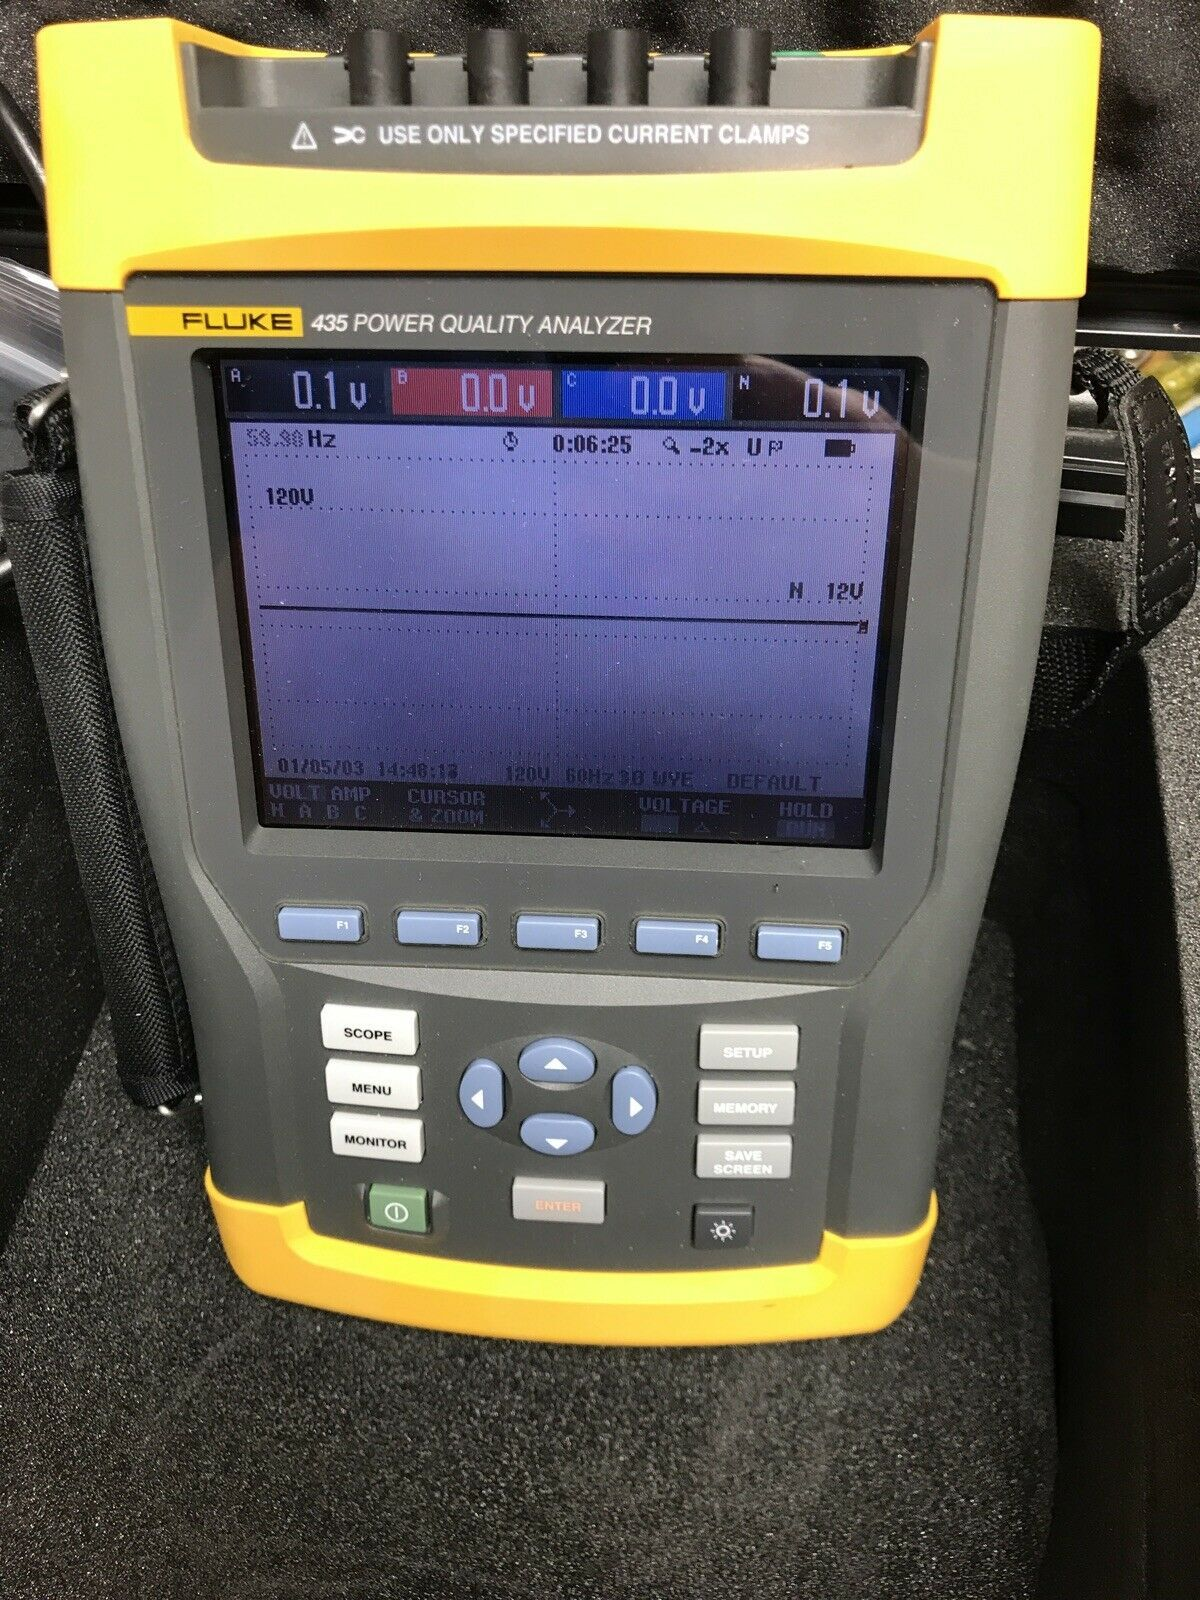 Fluke Power Analyzer Power Graphing Calculator Landline Phone